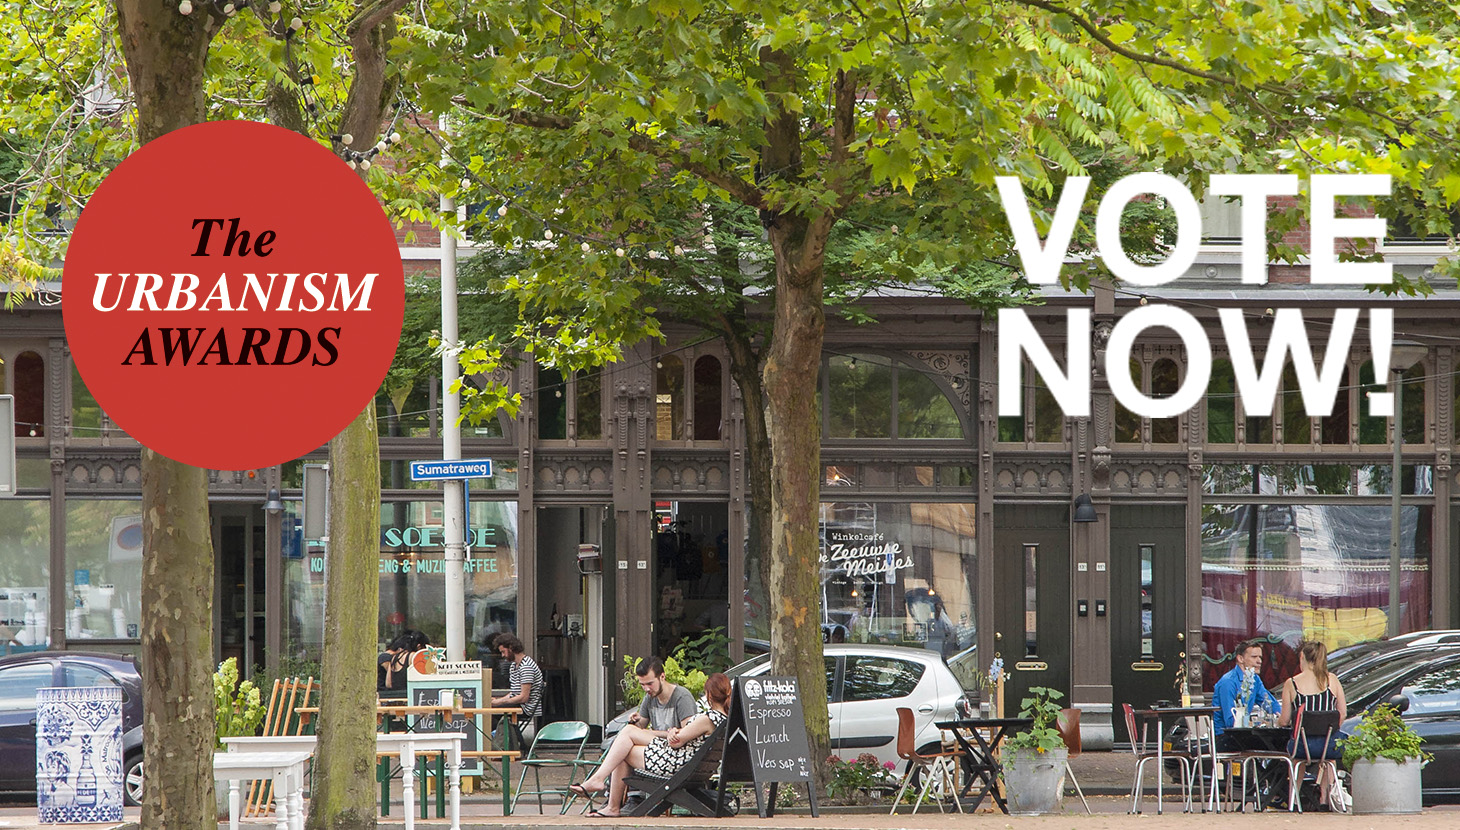 rotterdam-vote